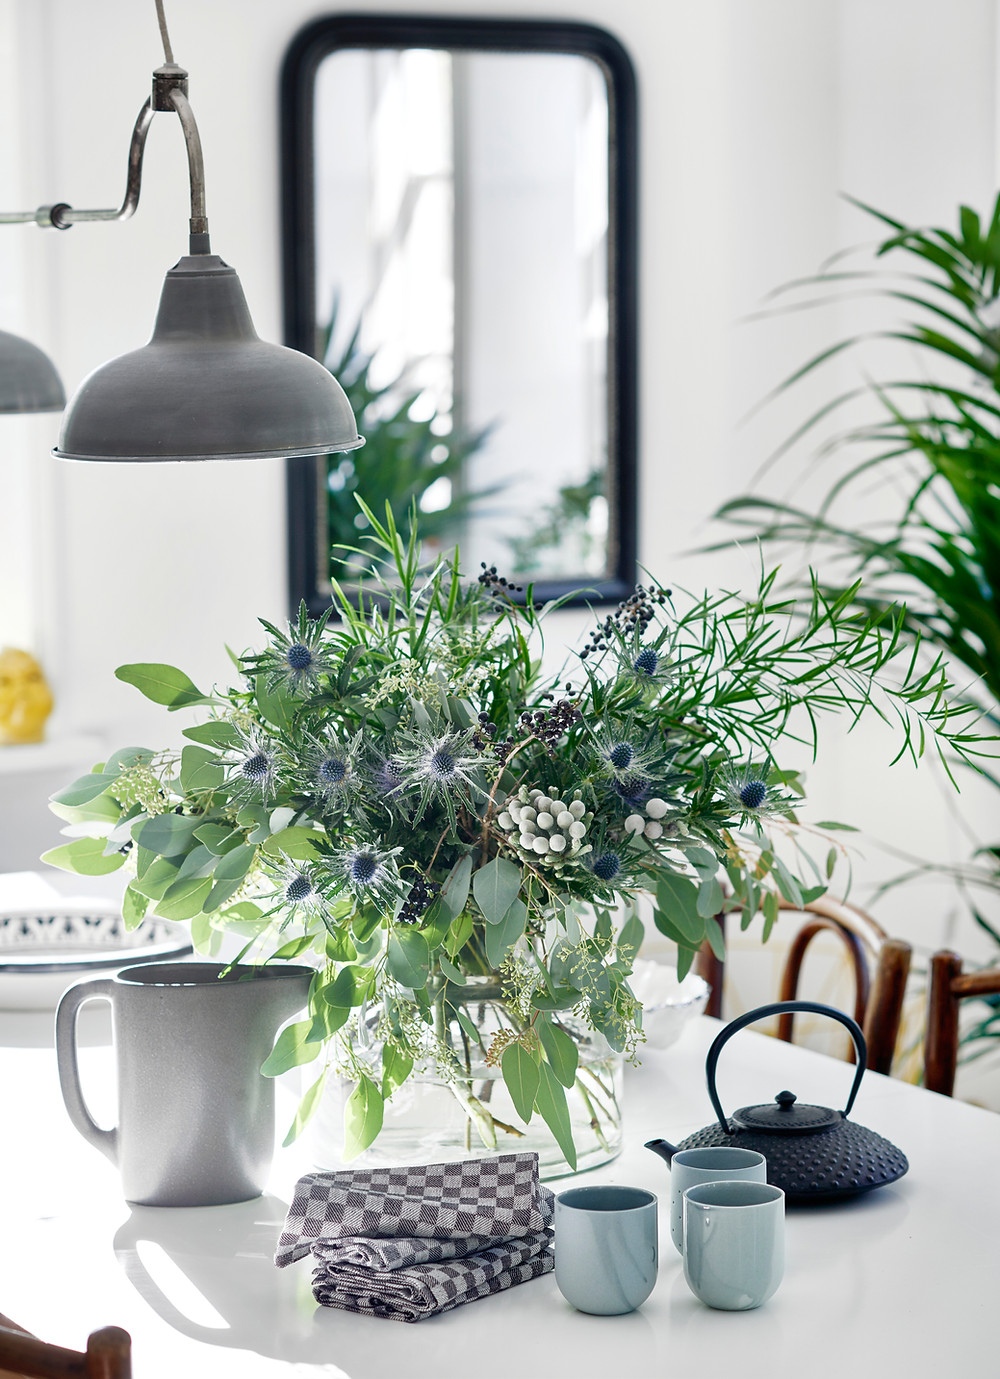 plants on a desk with a light